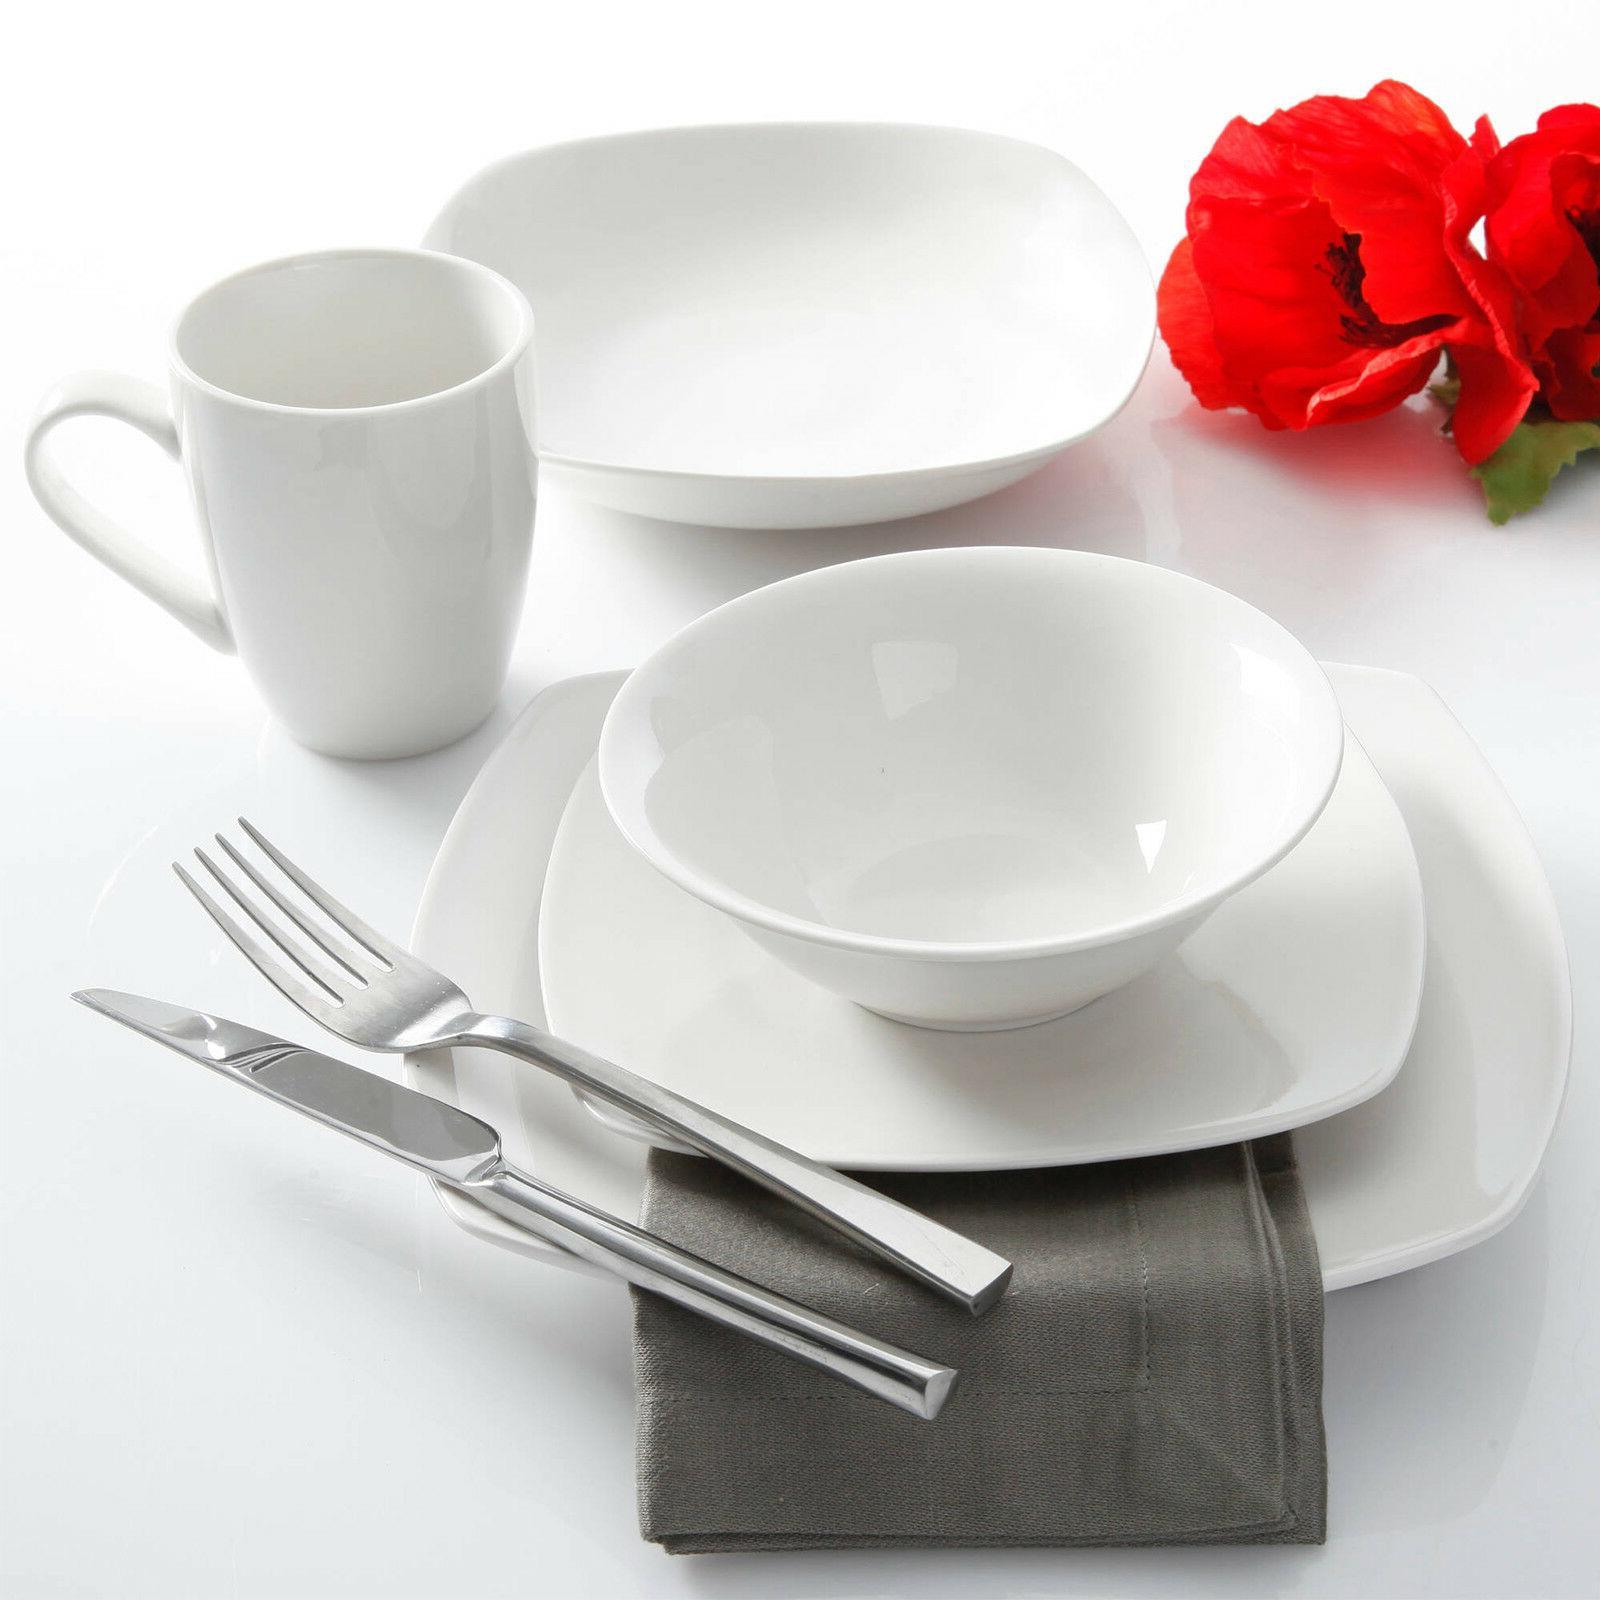 Porcelain 6 Round Kitchen Dishes